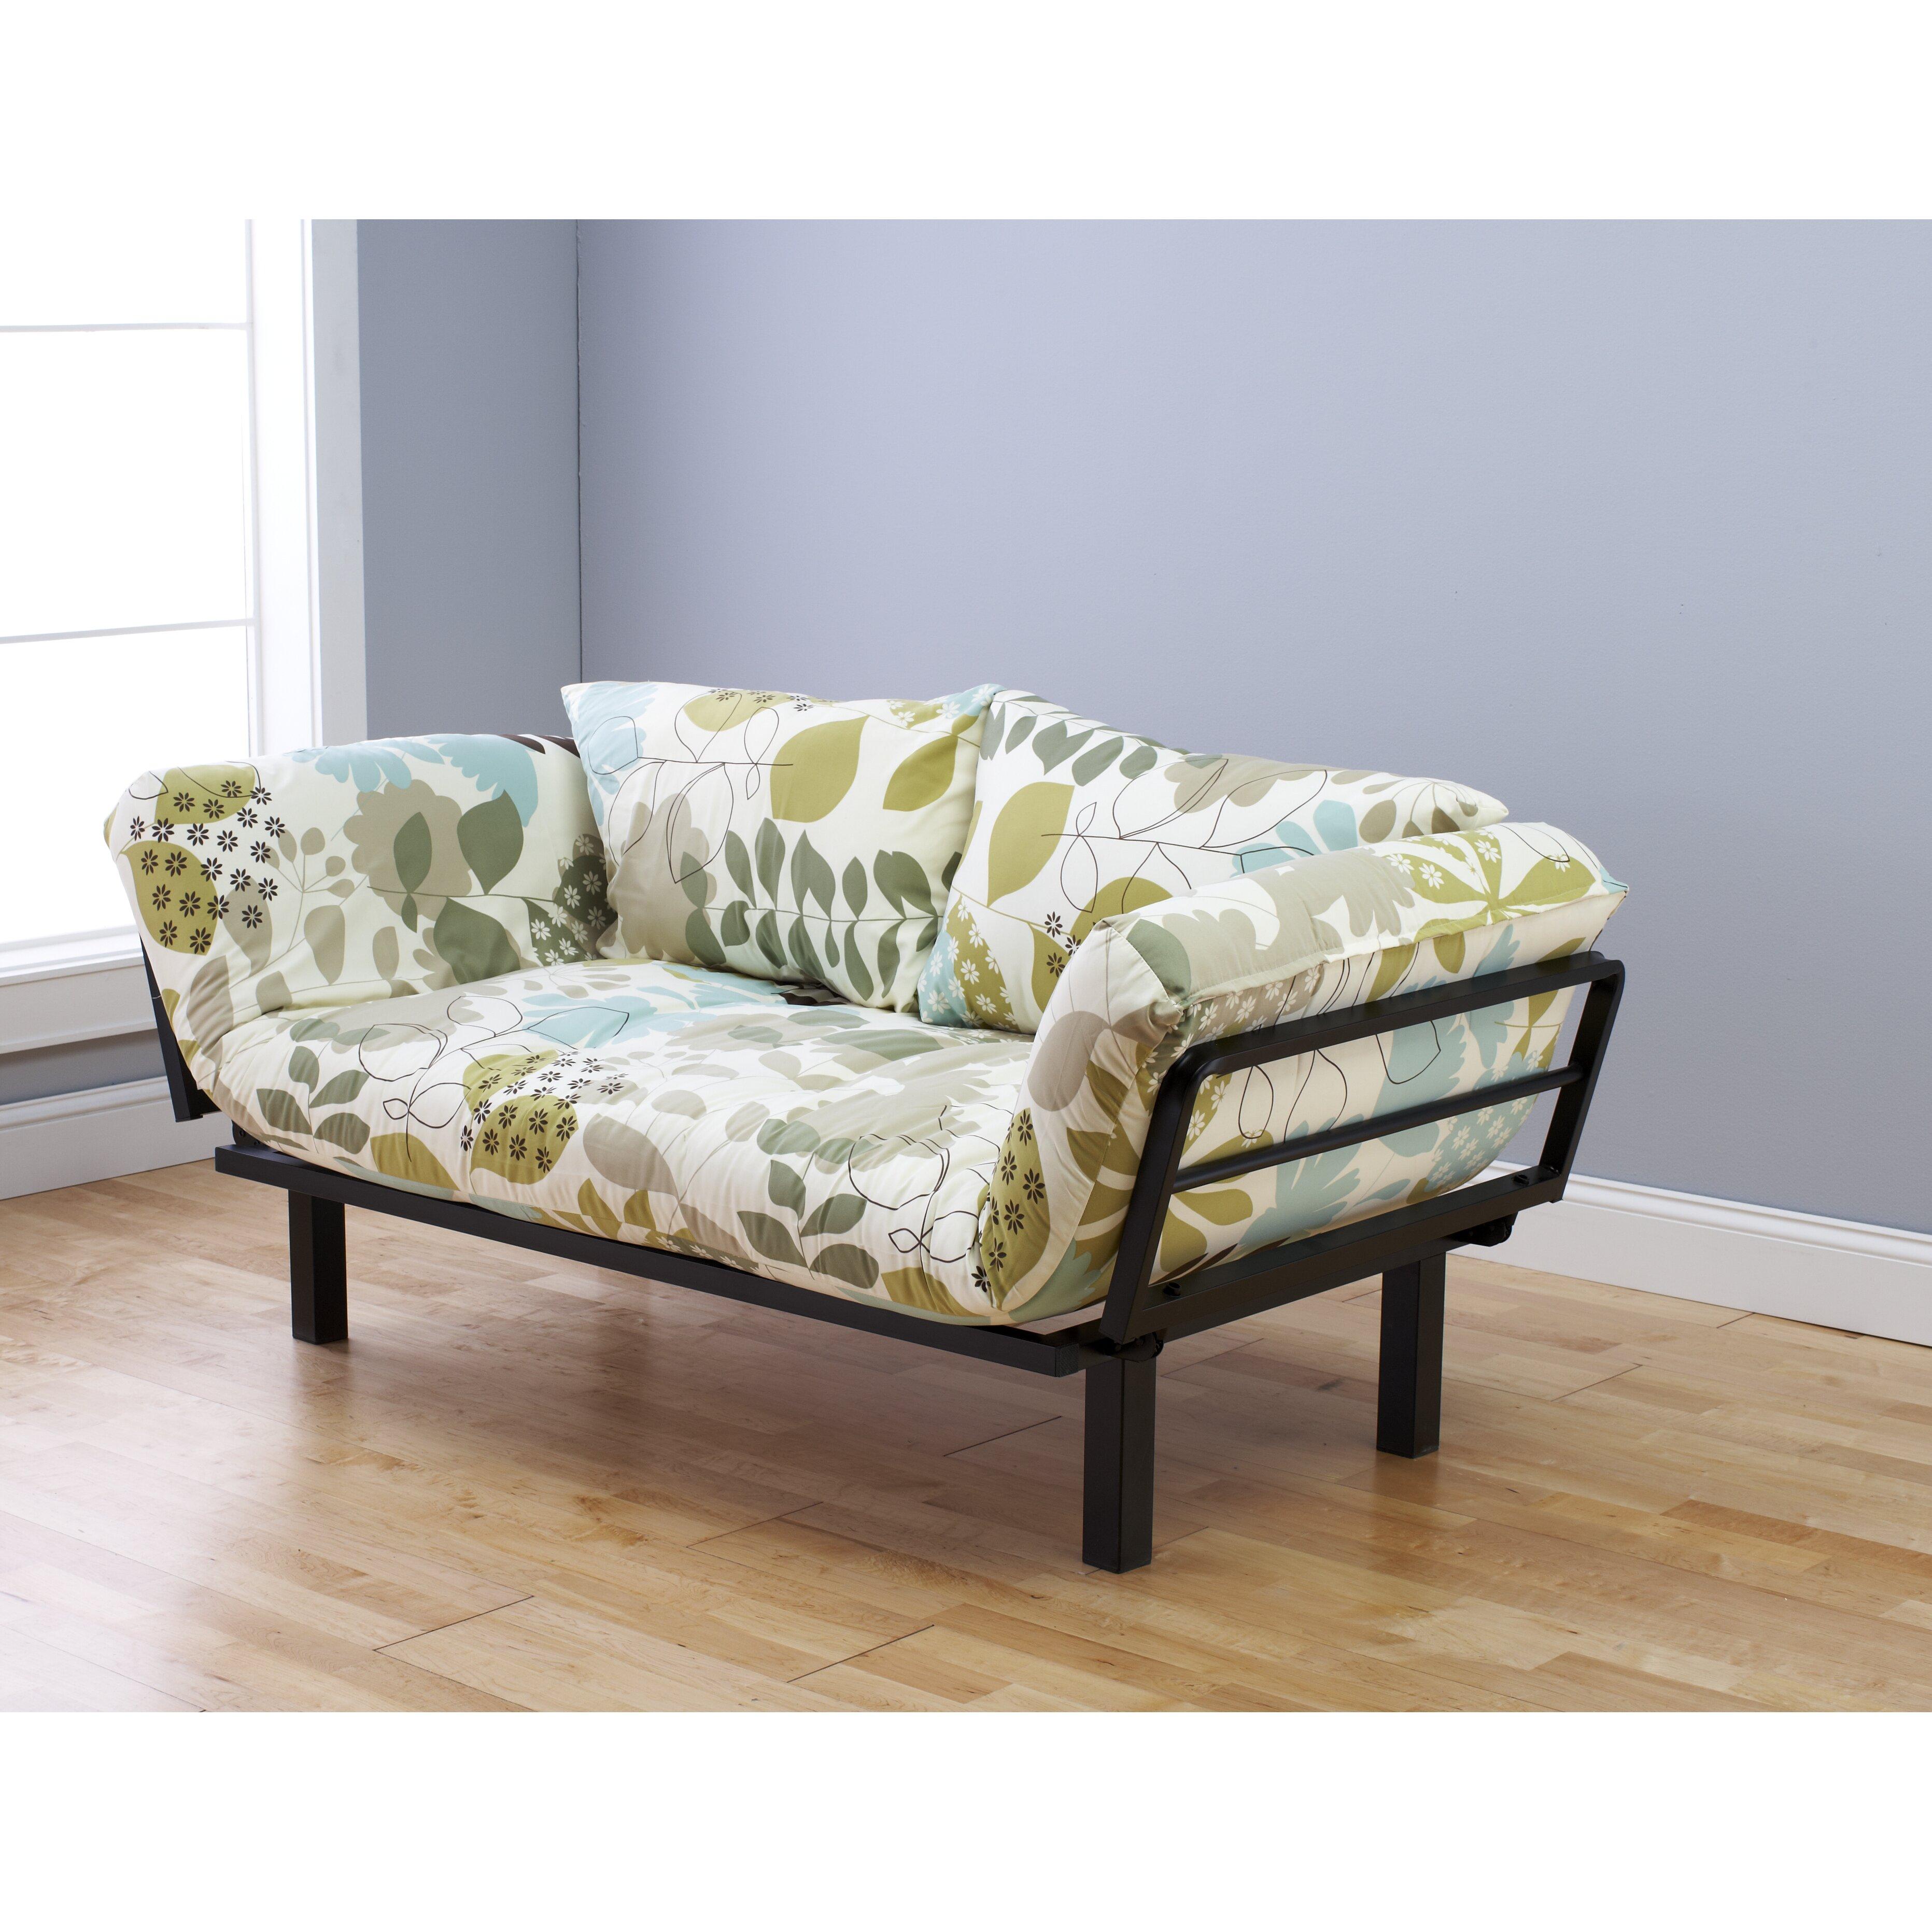 Kodiak furniture convertible sofa reviews wayfair for Sofa convertible 2 places